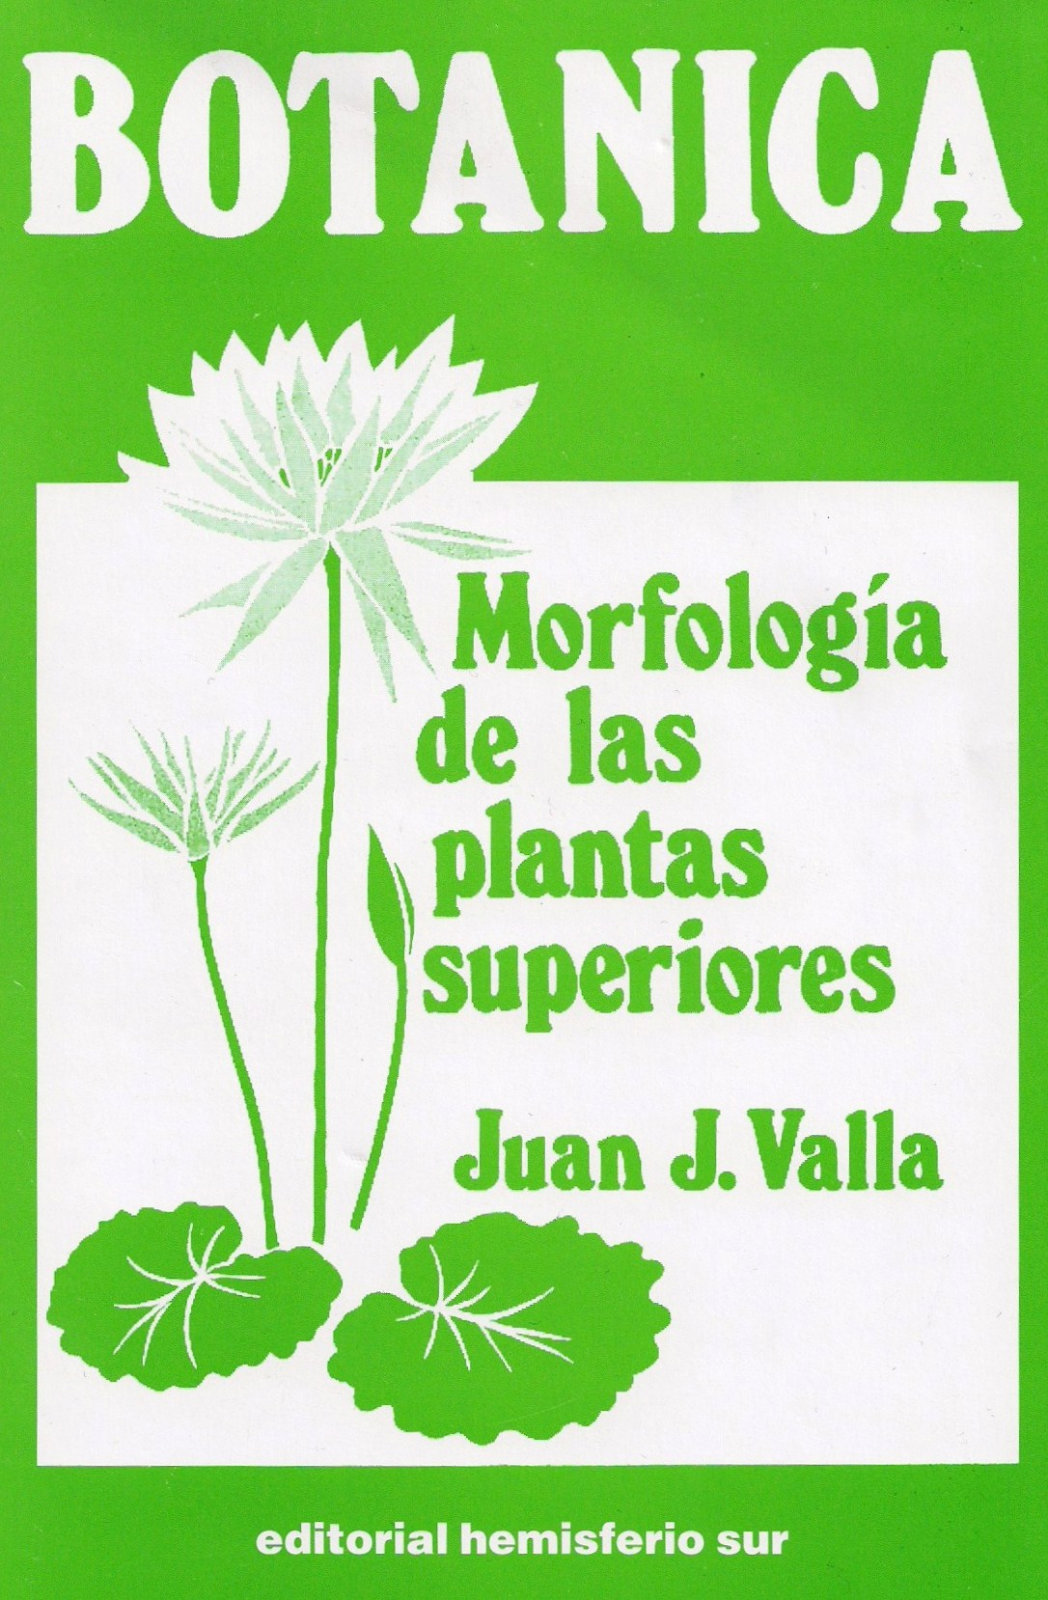 ingenieria forestal libro botanica morfologia de las